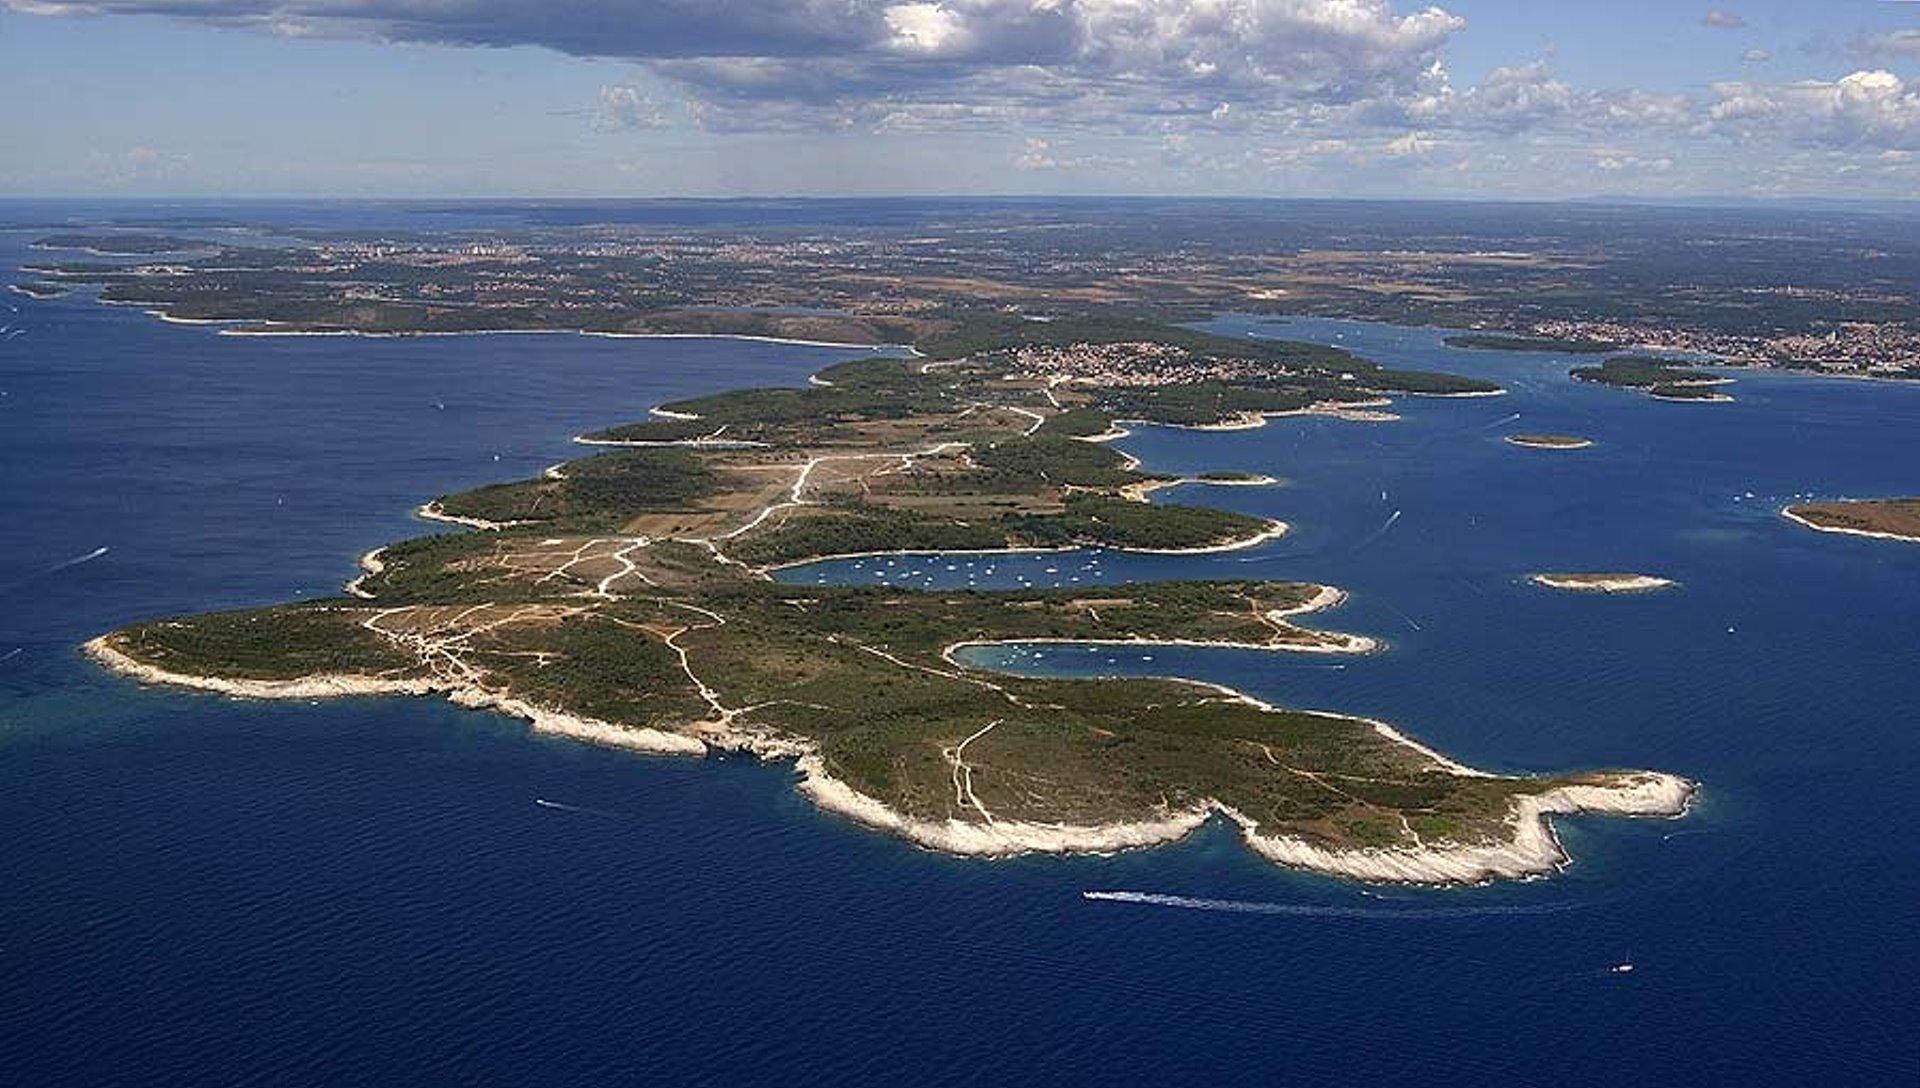 Sehenswürdigkeiten - Naturpark Kamenjak